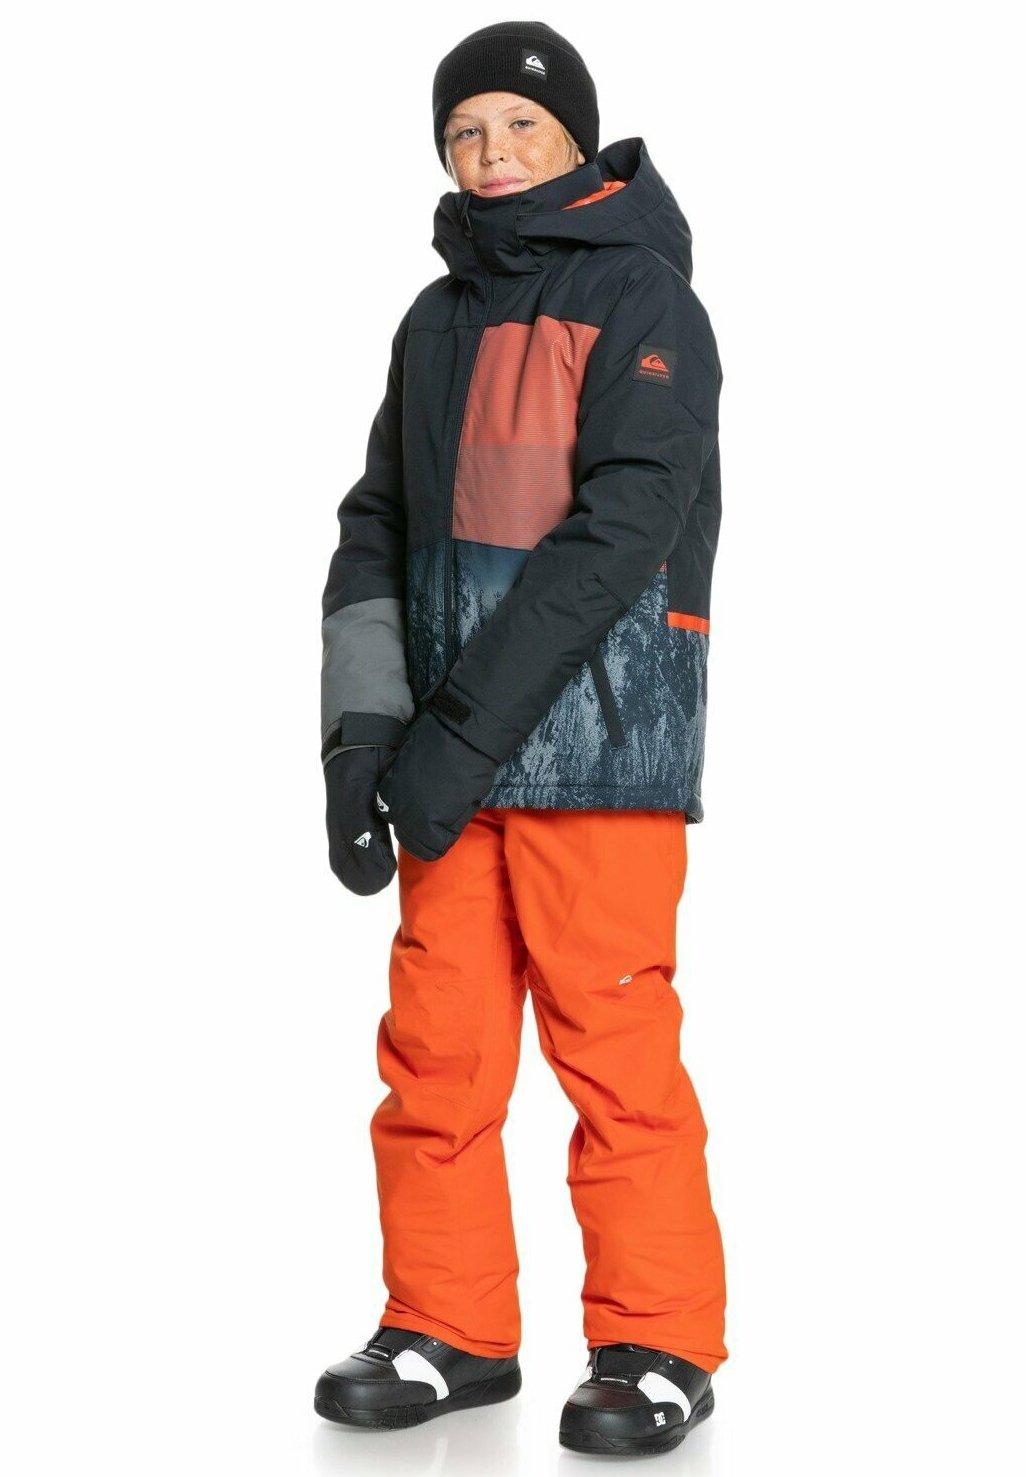 Kinder Snowboardjacke